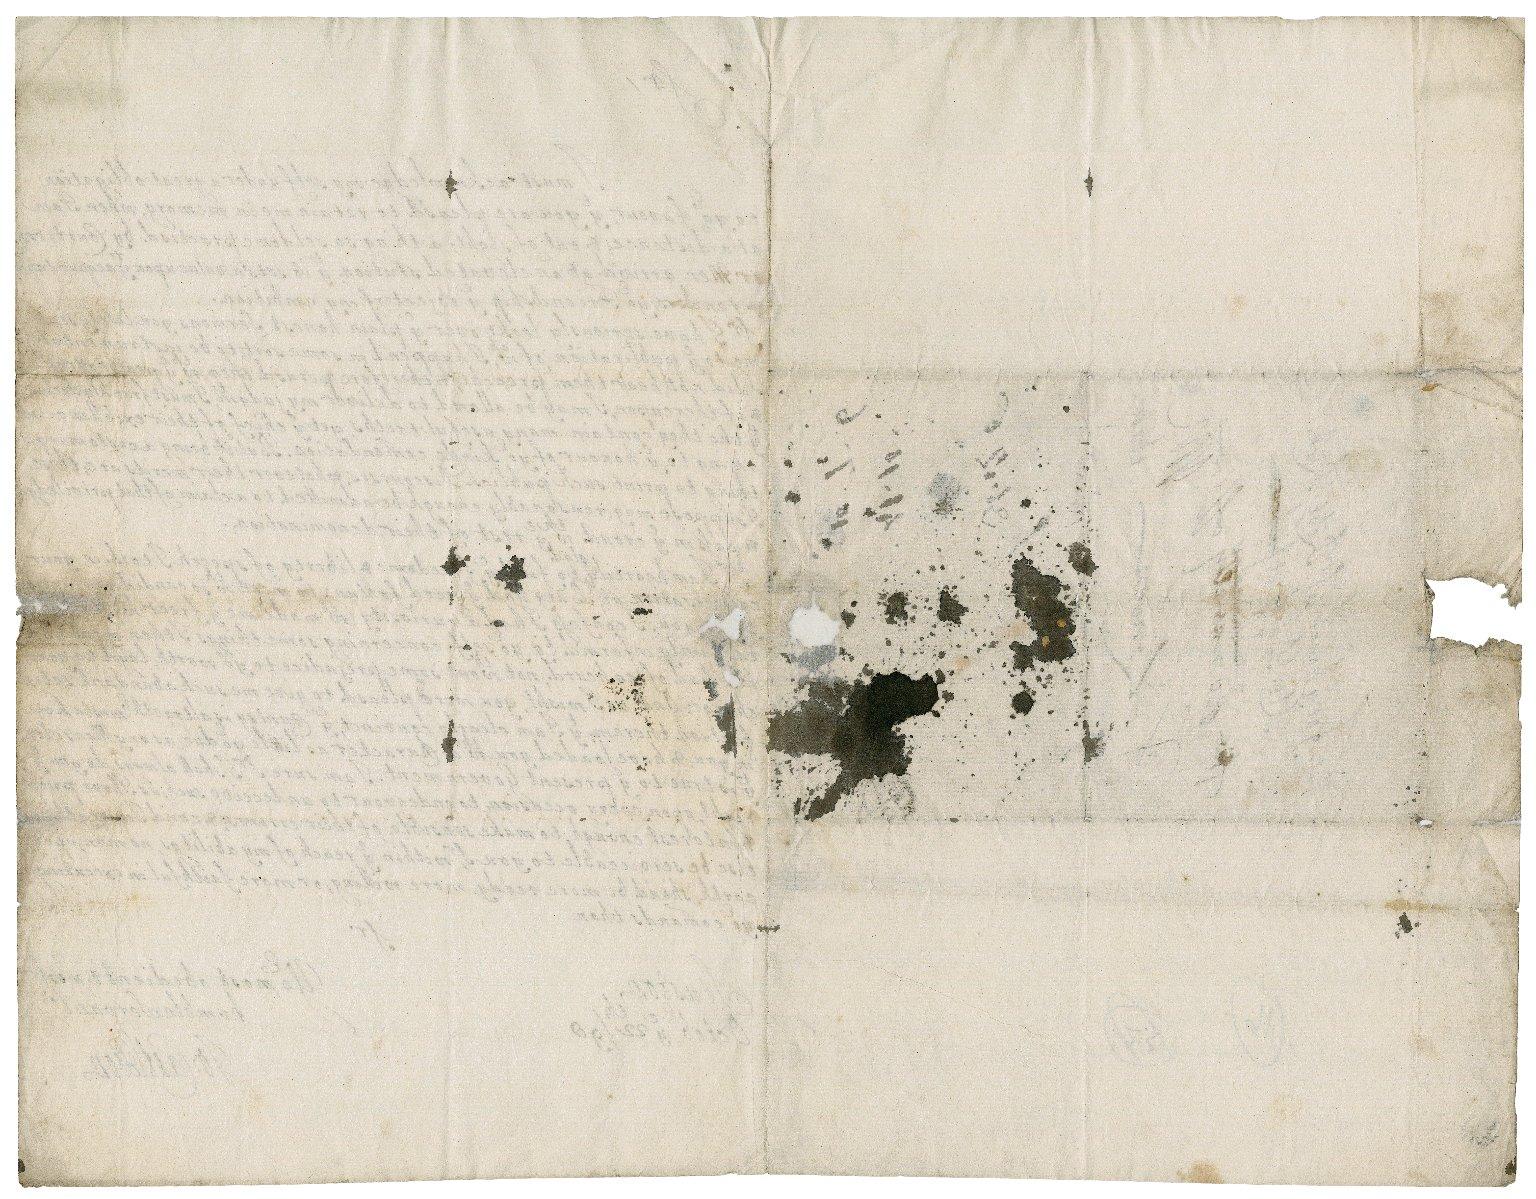 Letter from Sir John Castleton, Stuston, Suffolk, to Sir Robert Rich